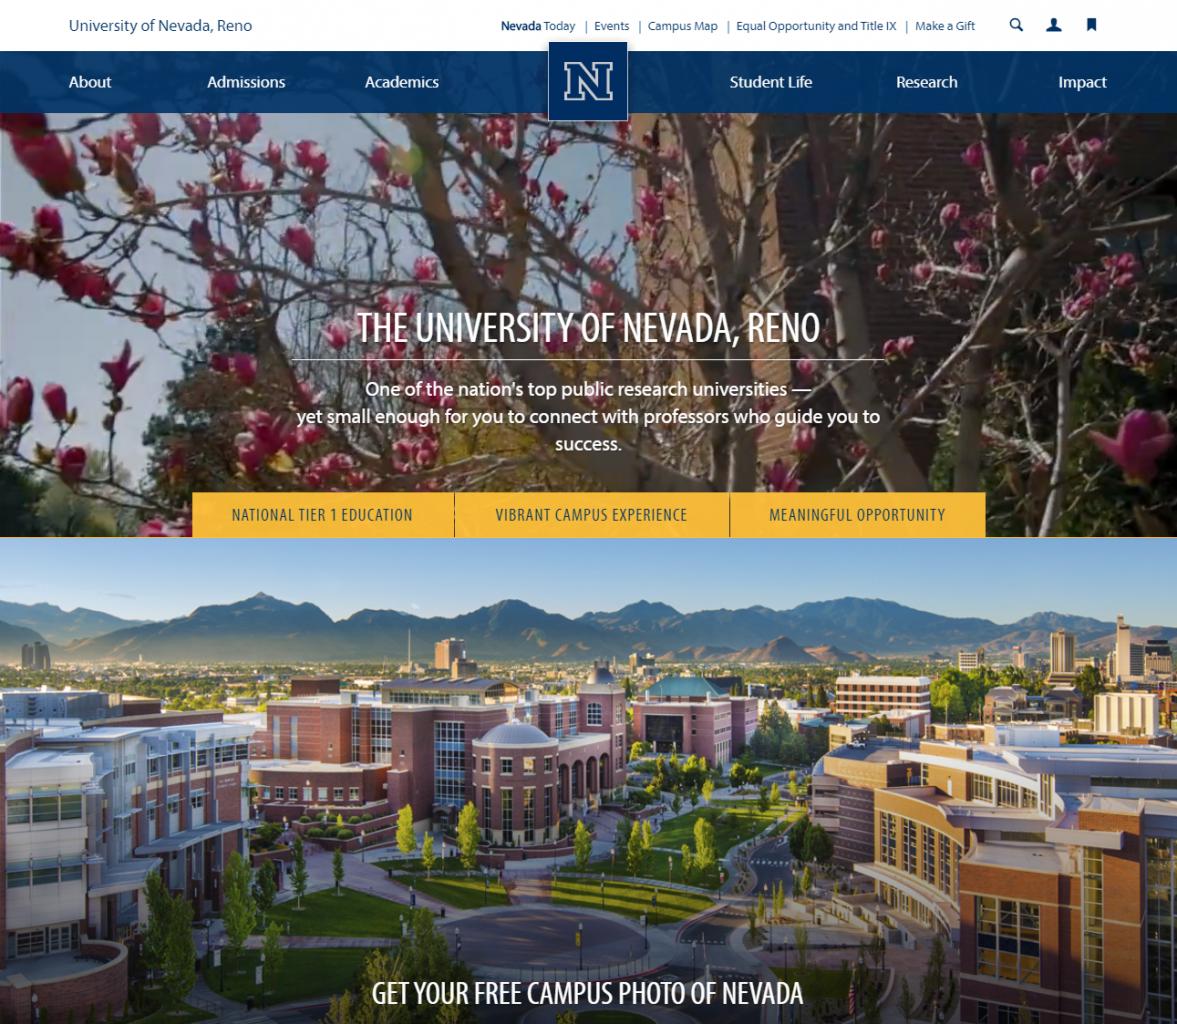 Unr Campus Map Pdf.20 Favorite Higher Ed Websites Selected By Peers Higher Ed Experts